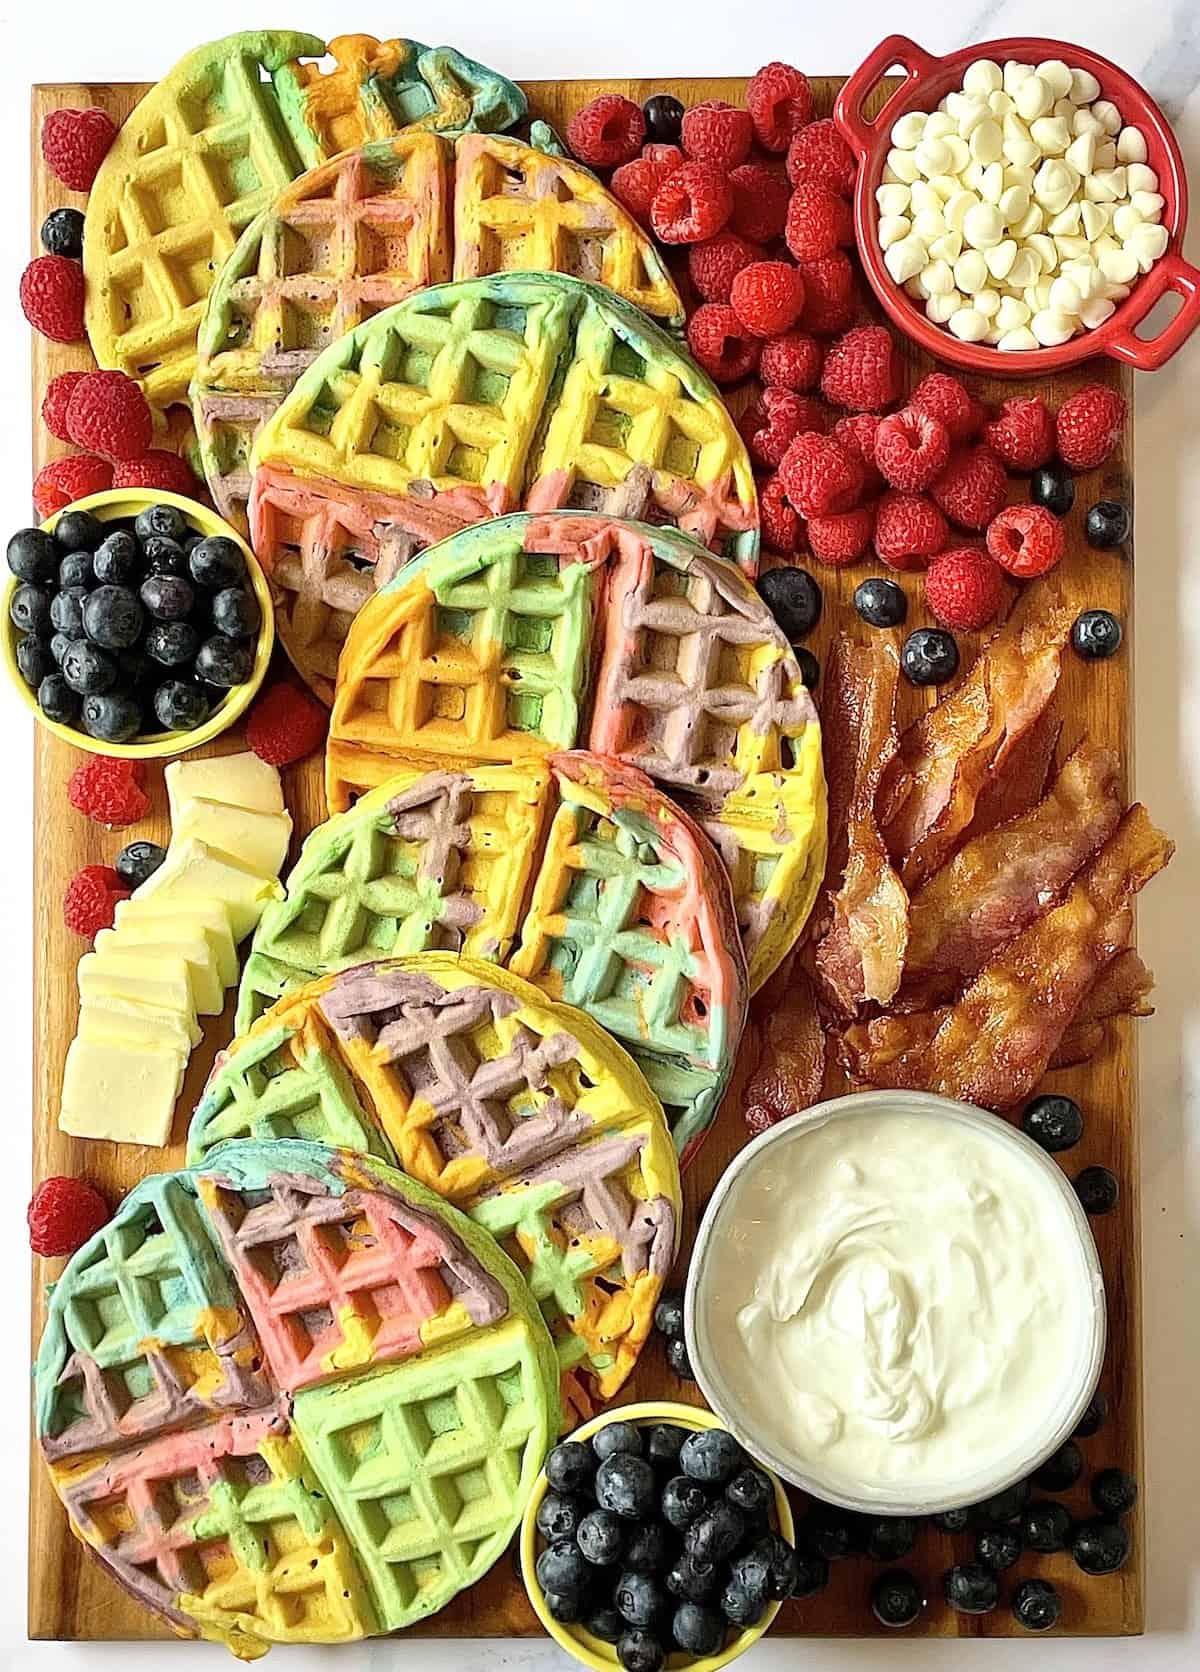 rainbow waffles, bacon, and fruit on a charcuterie board